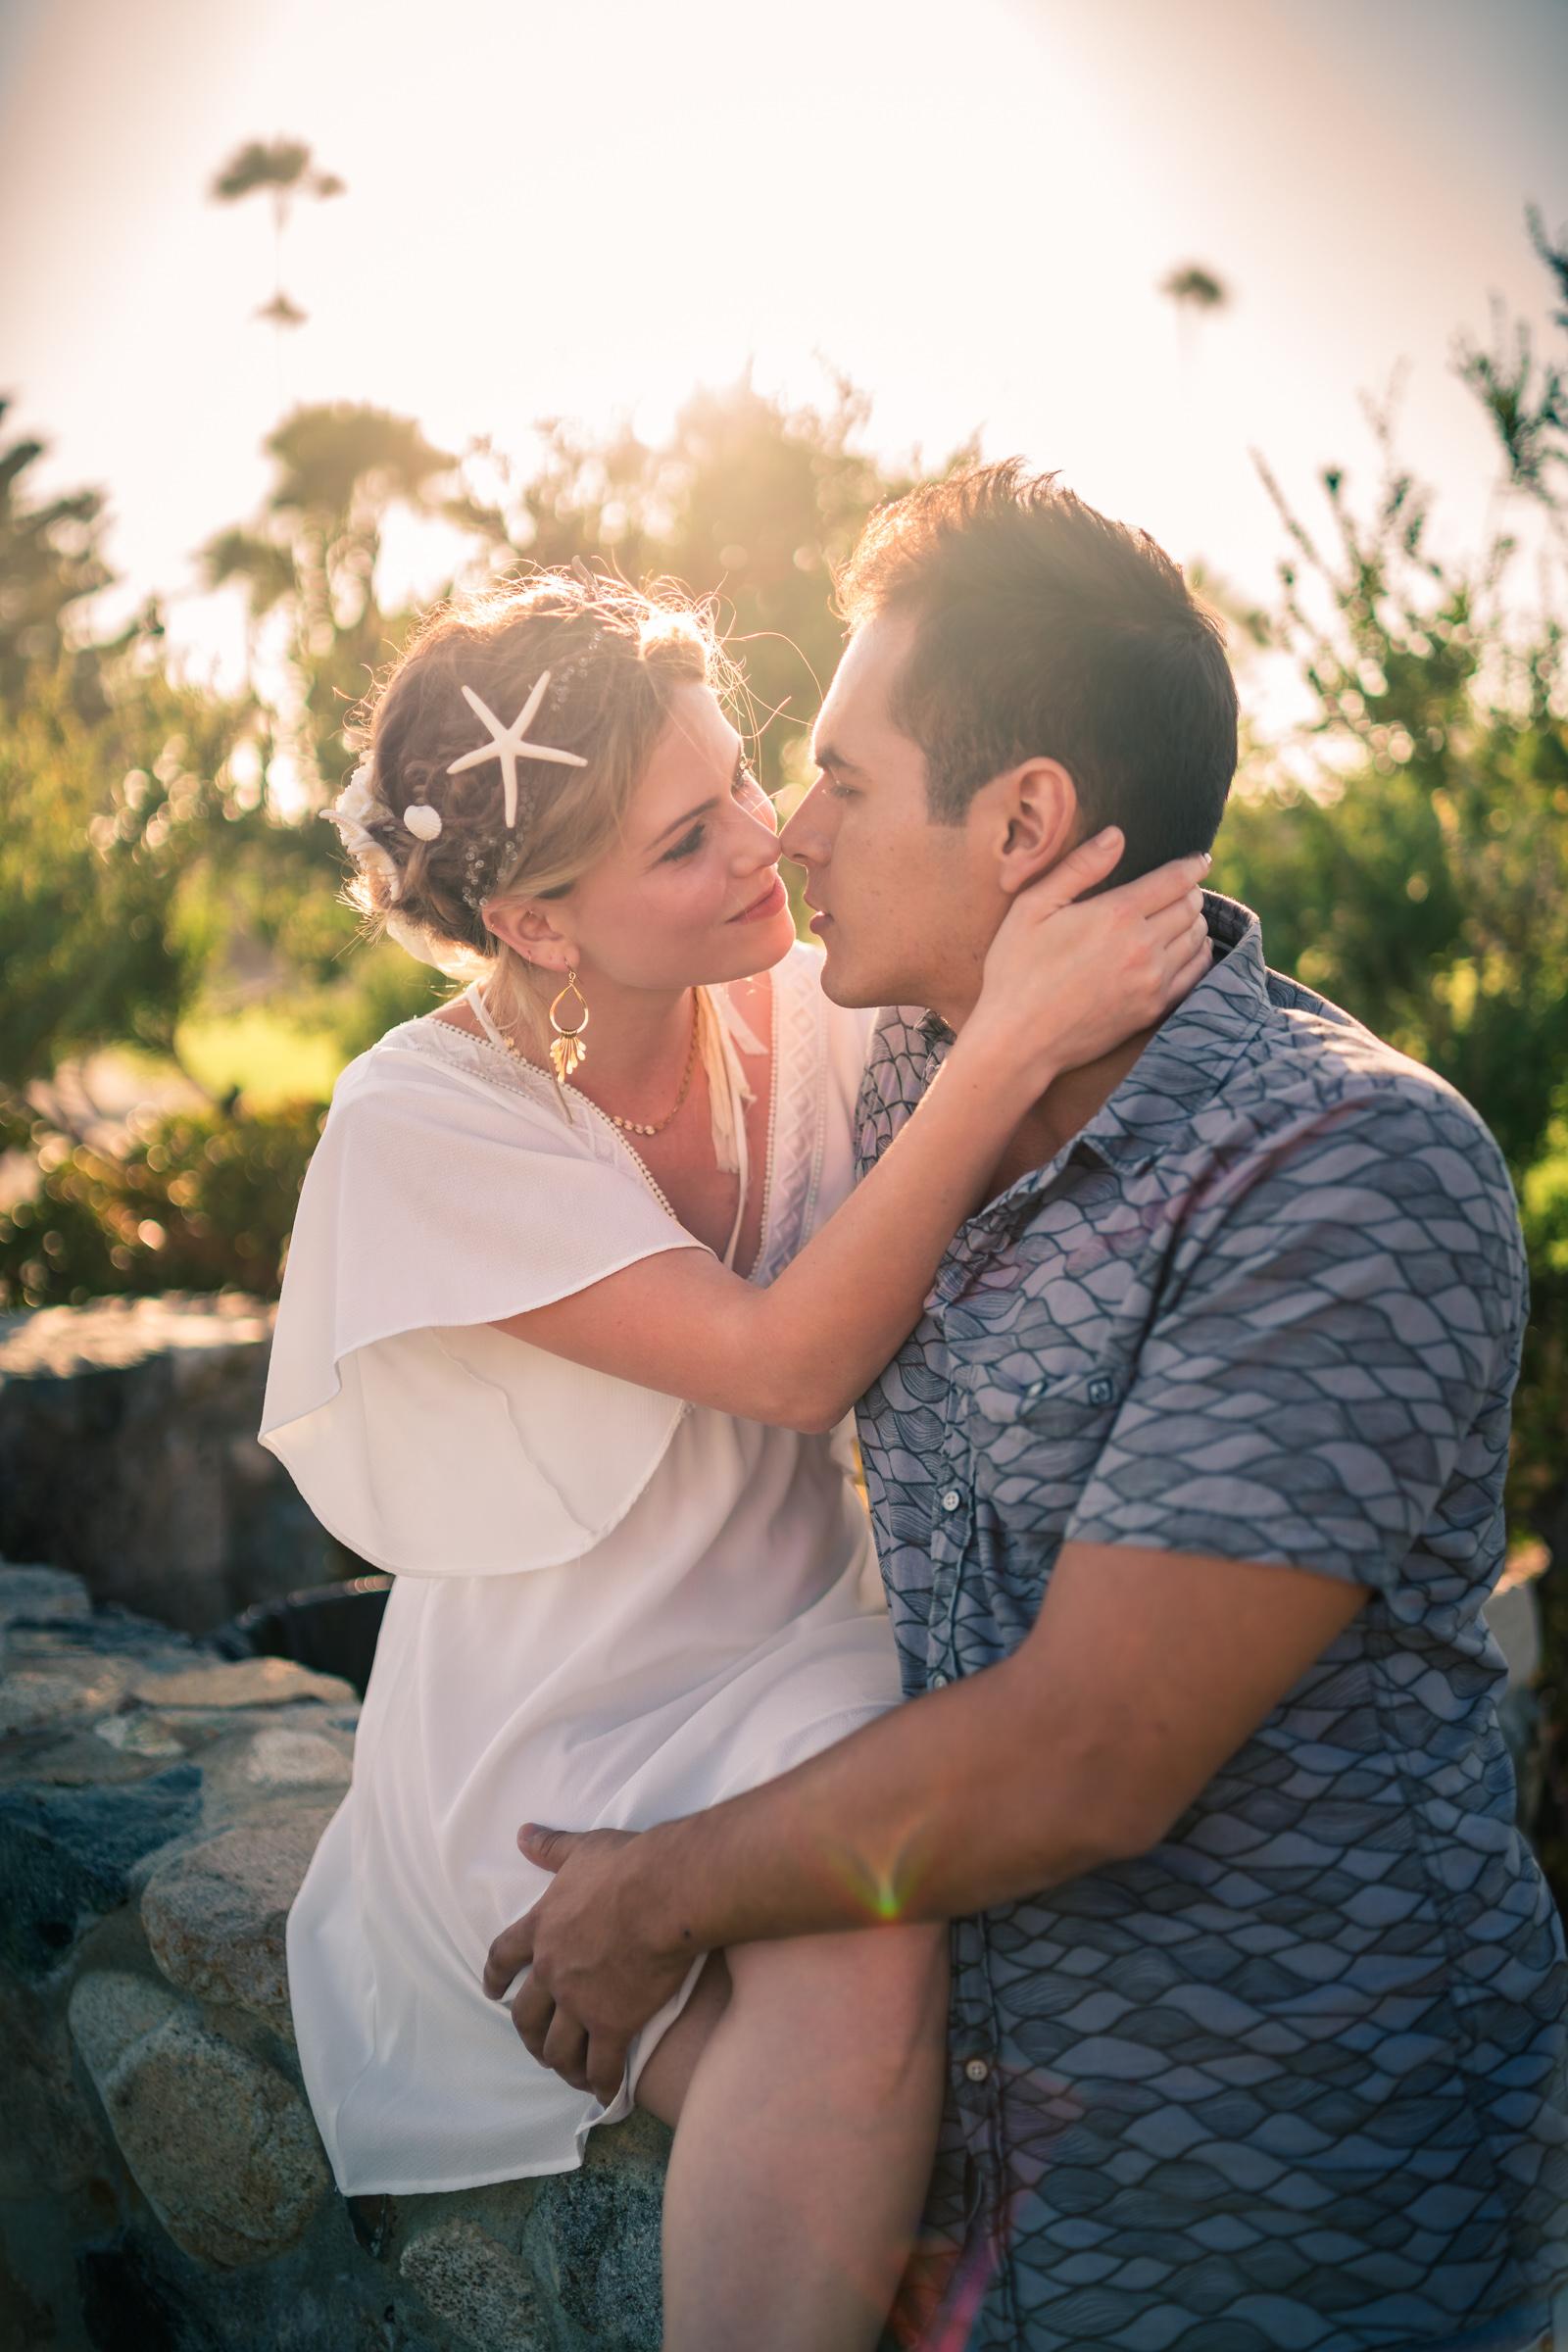 1__Bruno-Amanda-Laguna-beach-engagement_Joseph-Barber-Weddings_2805.jpg